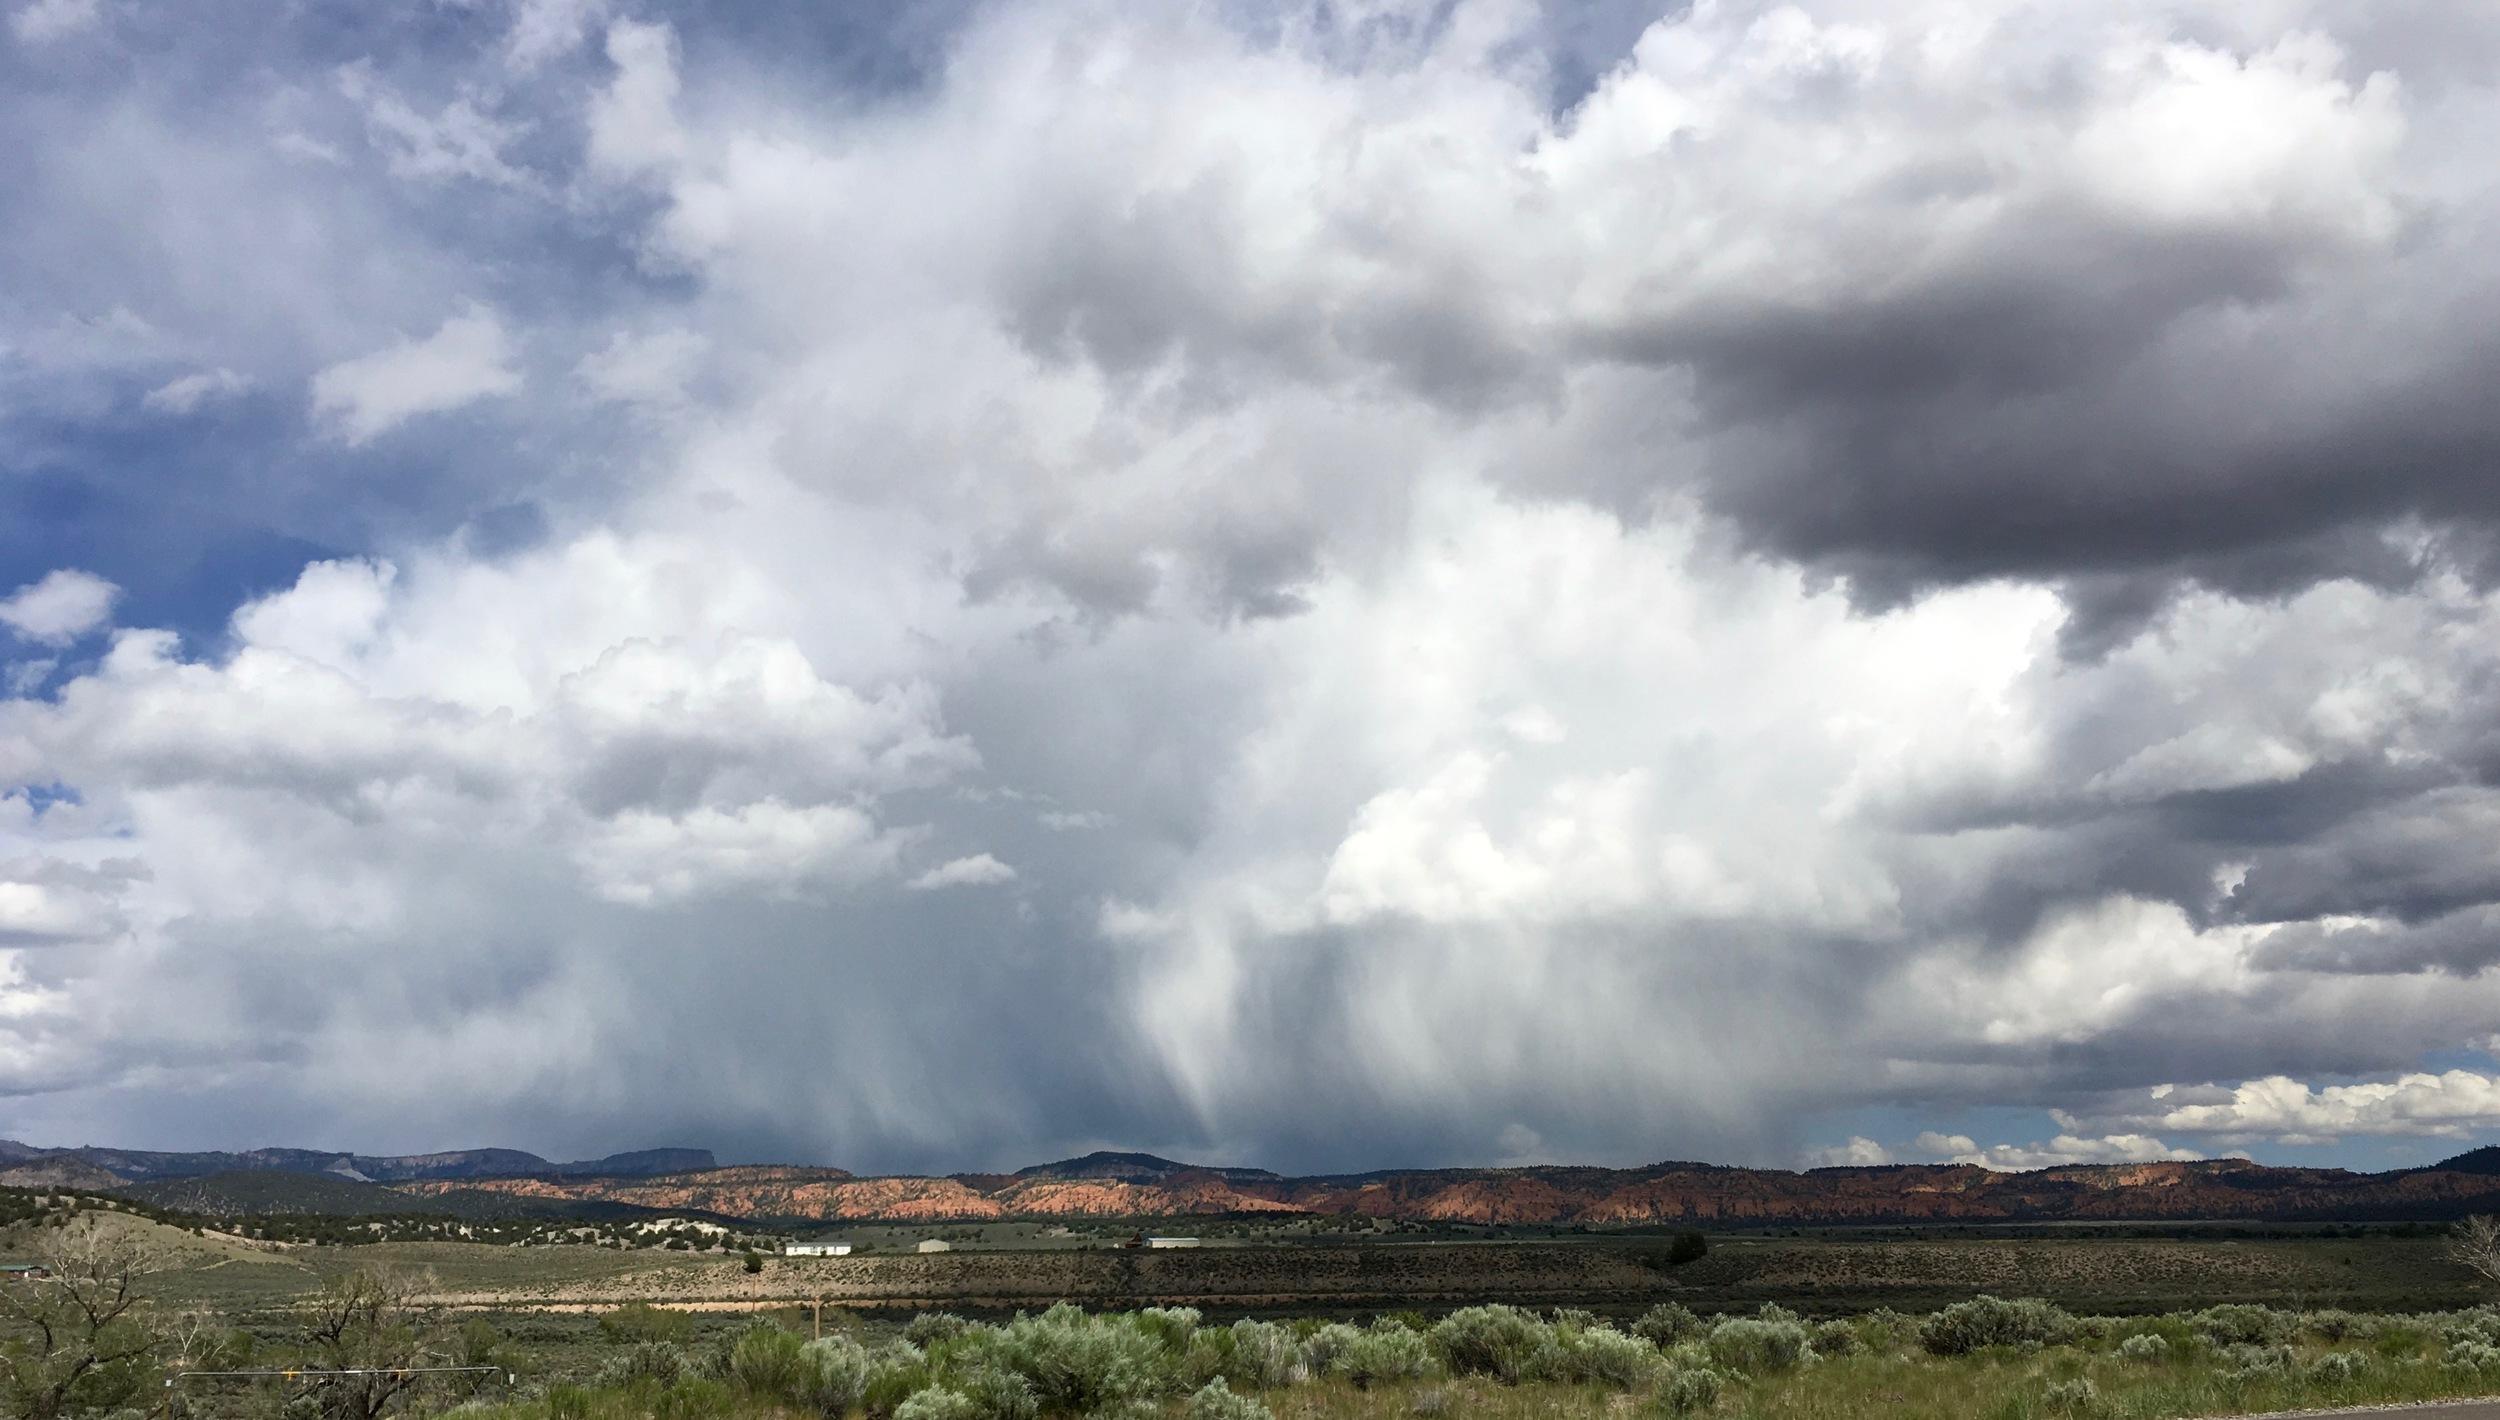 Rain clouds near Panguitch, Utah, as I biked toward Red Canyon State Park.